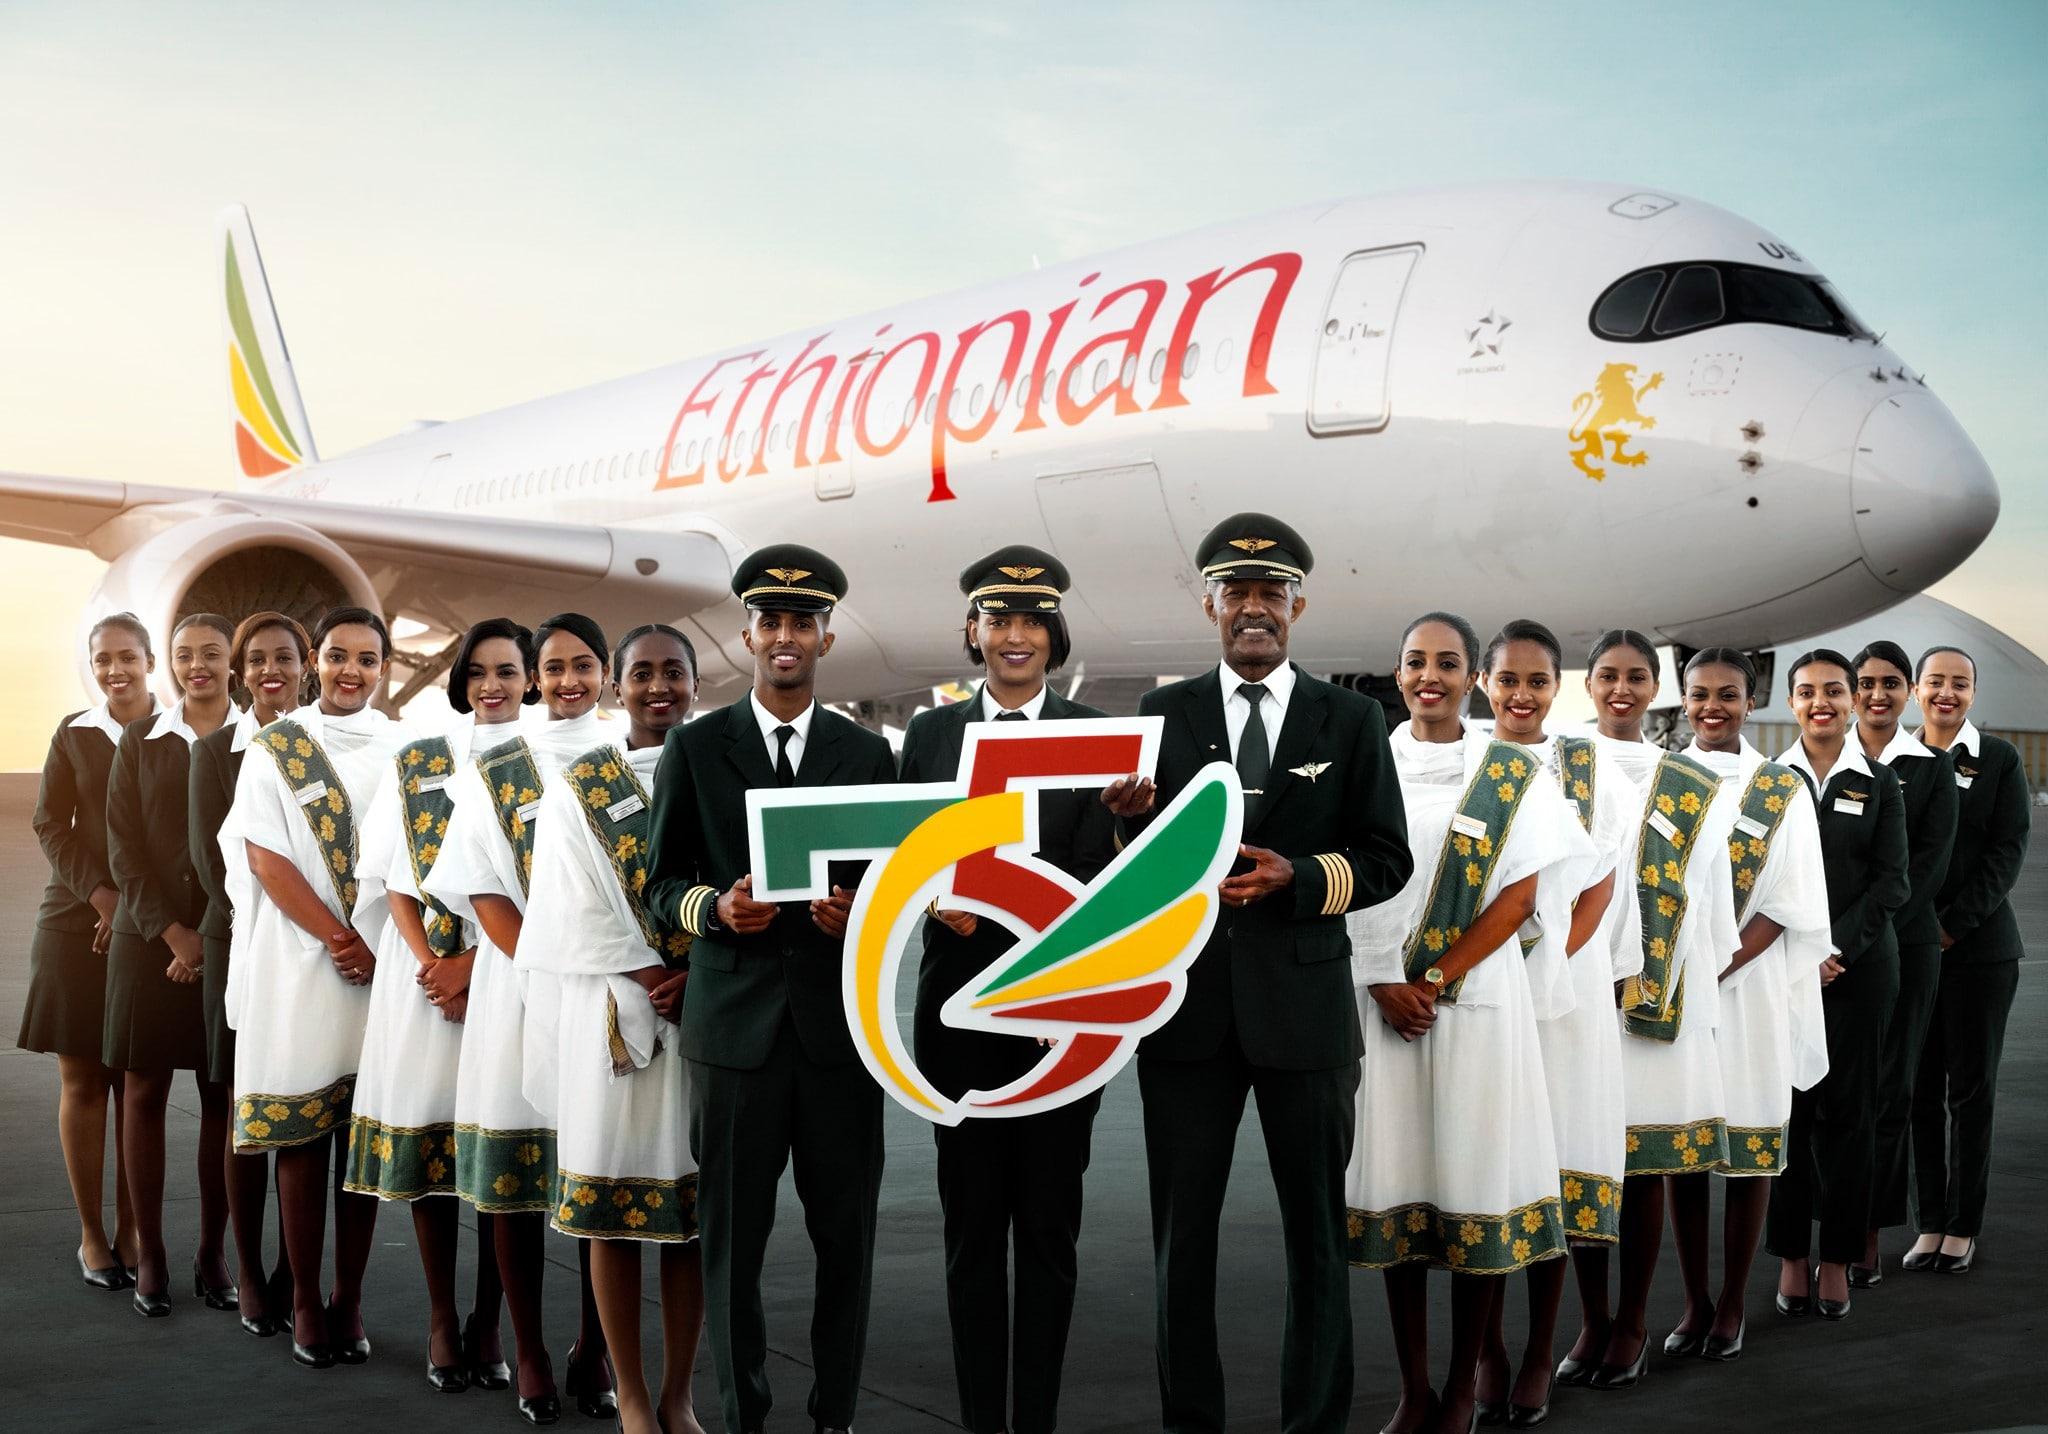 ethiopian airline-min